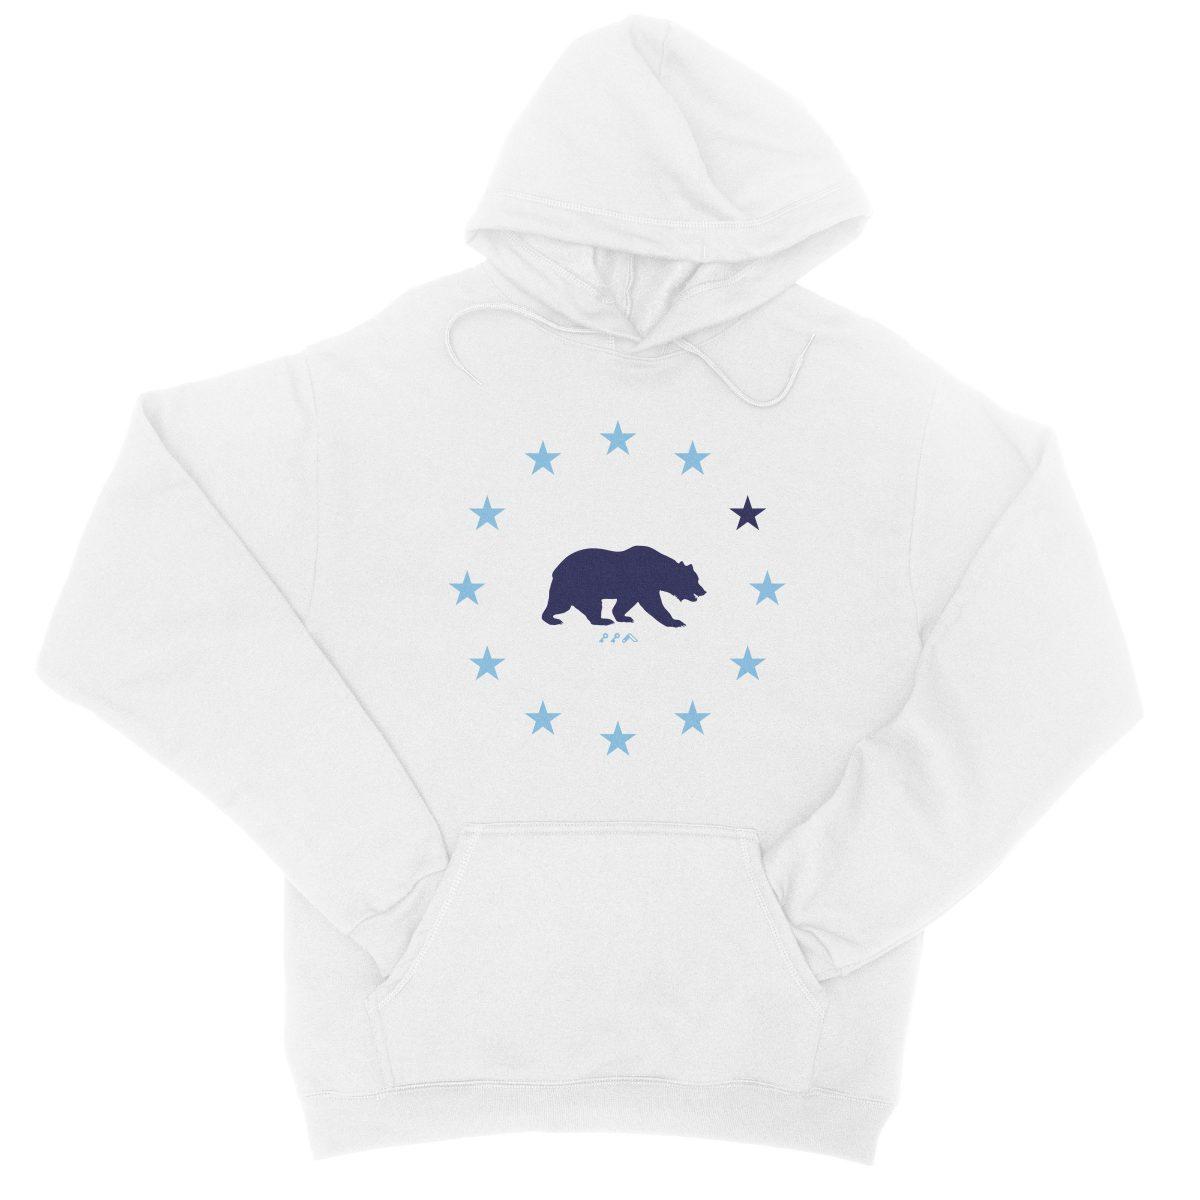 STAR GAZING california republic cali bear hoodie in white by kikicutt